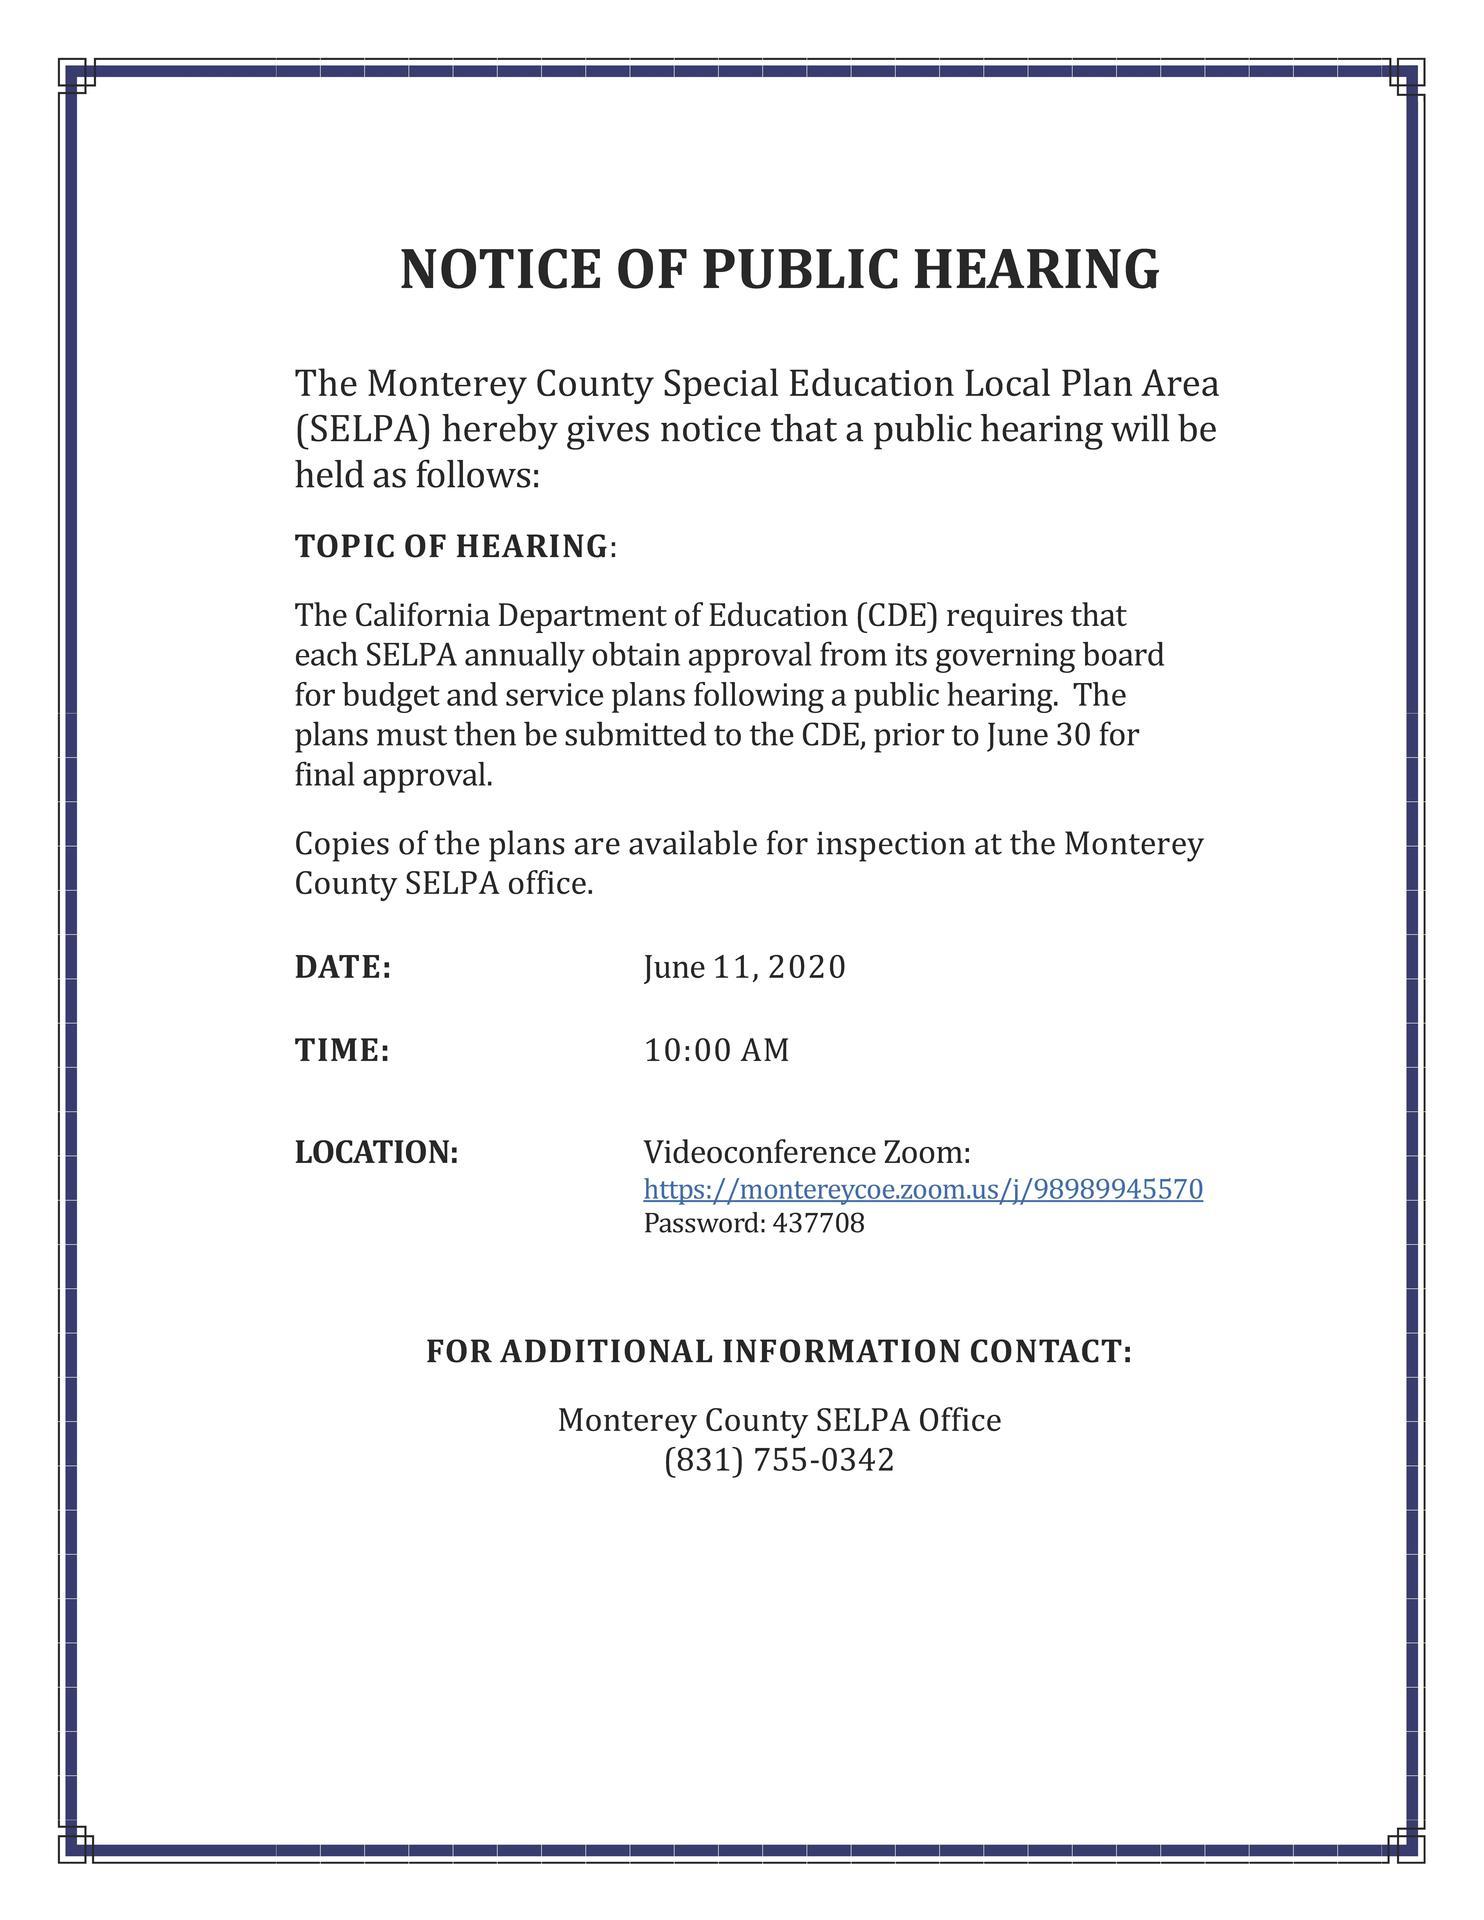 SELPA Public Hearing